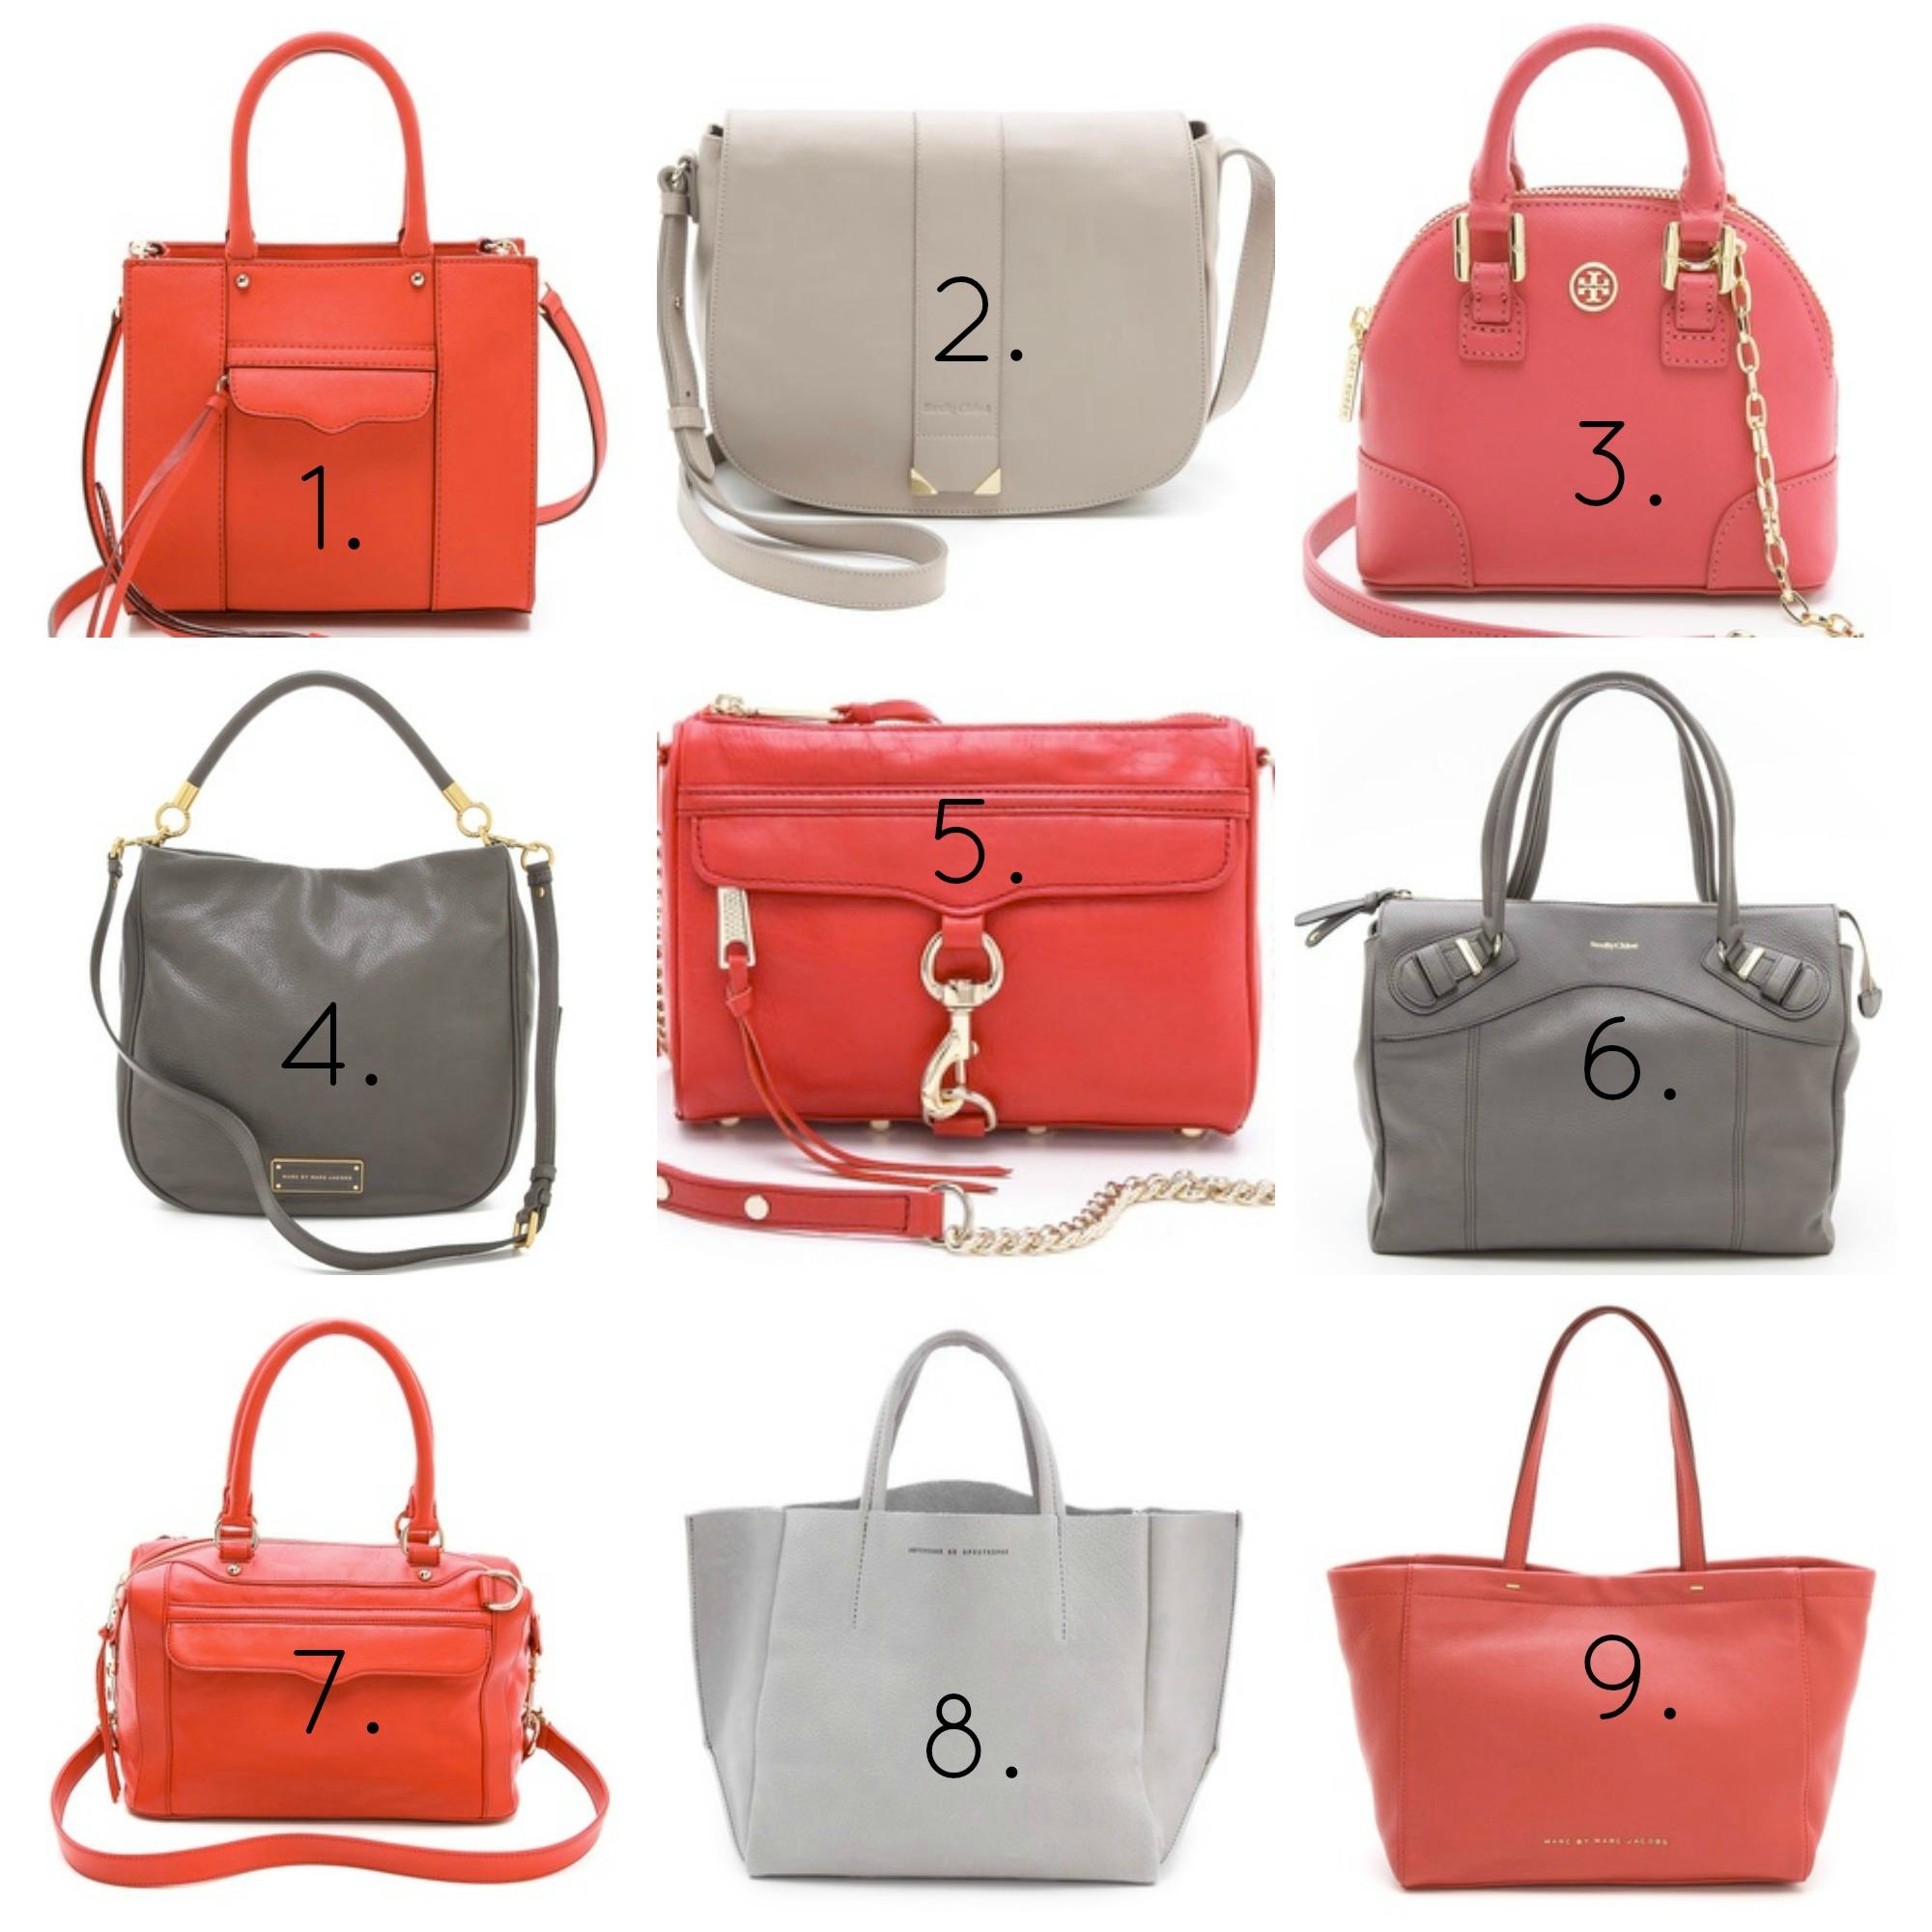 Scarlet & Gray Bags